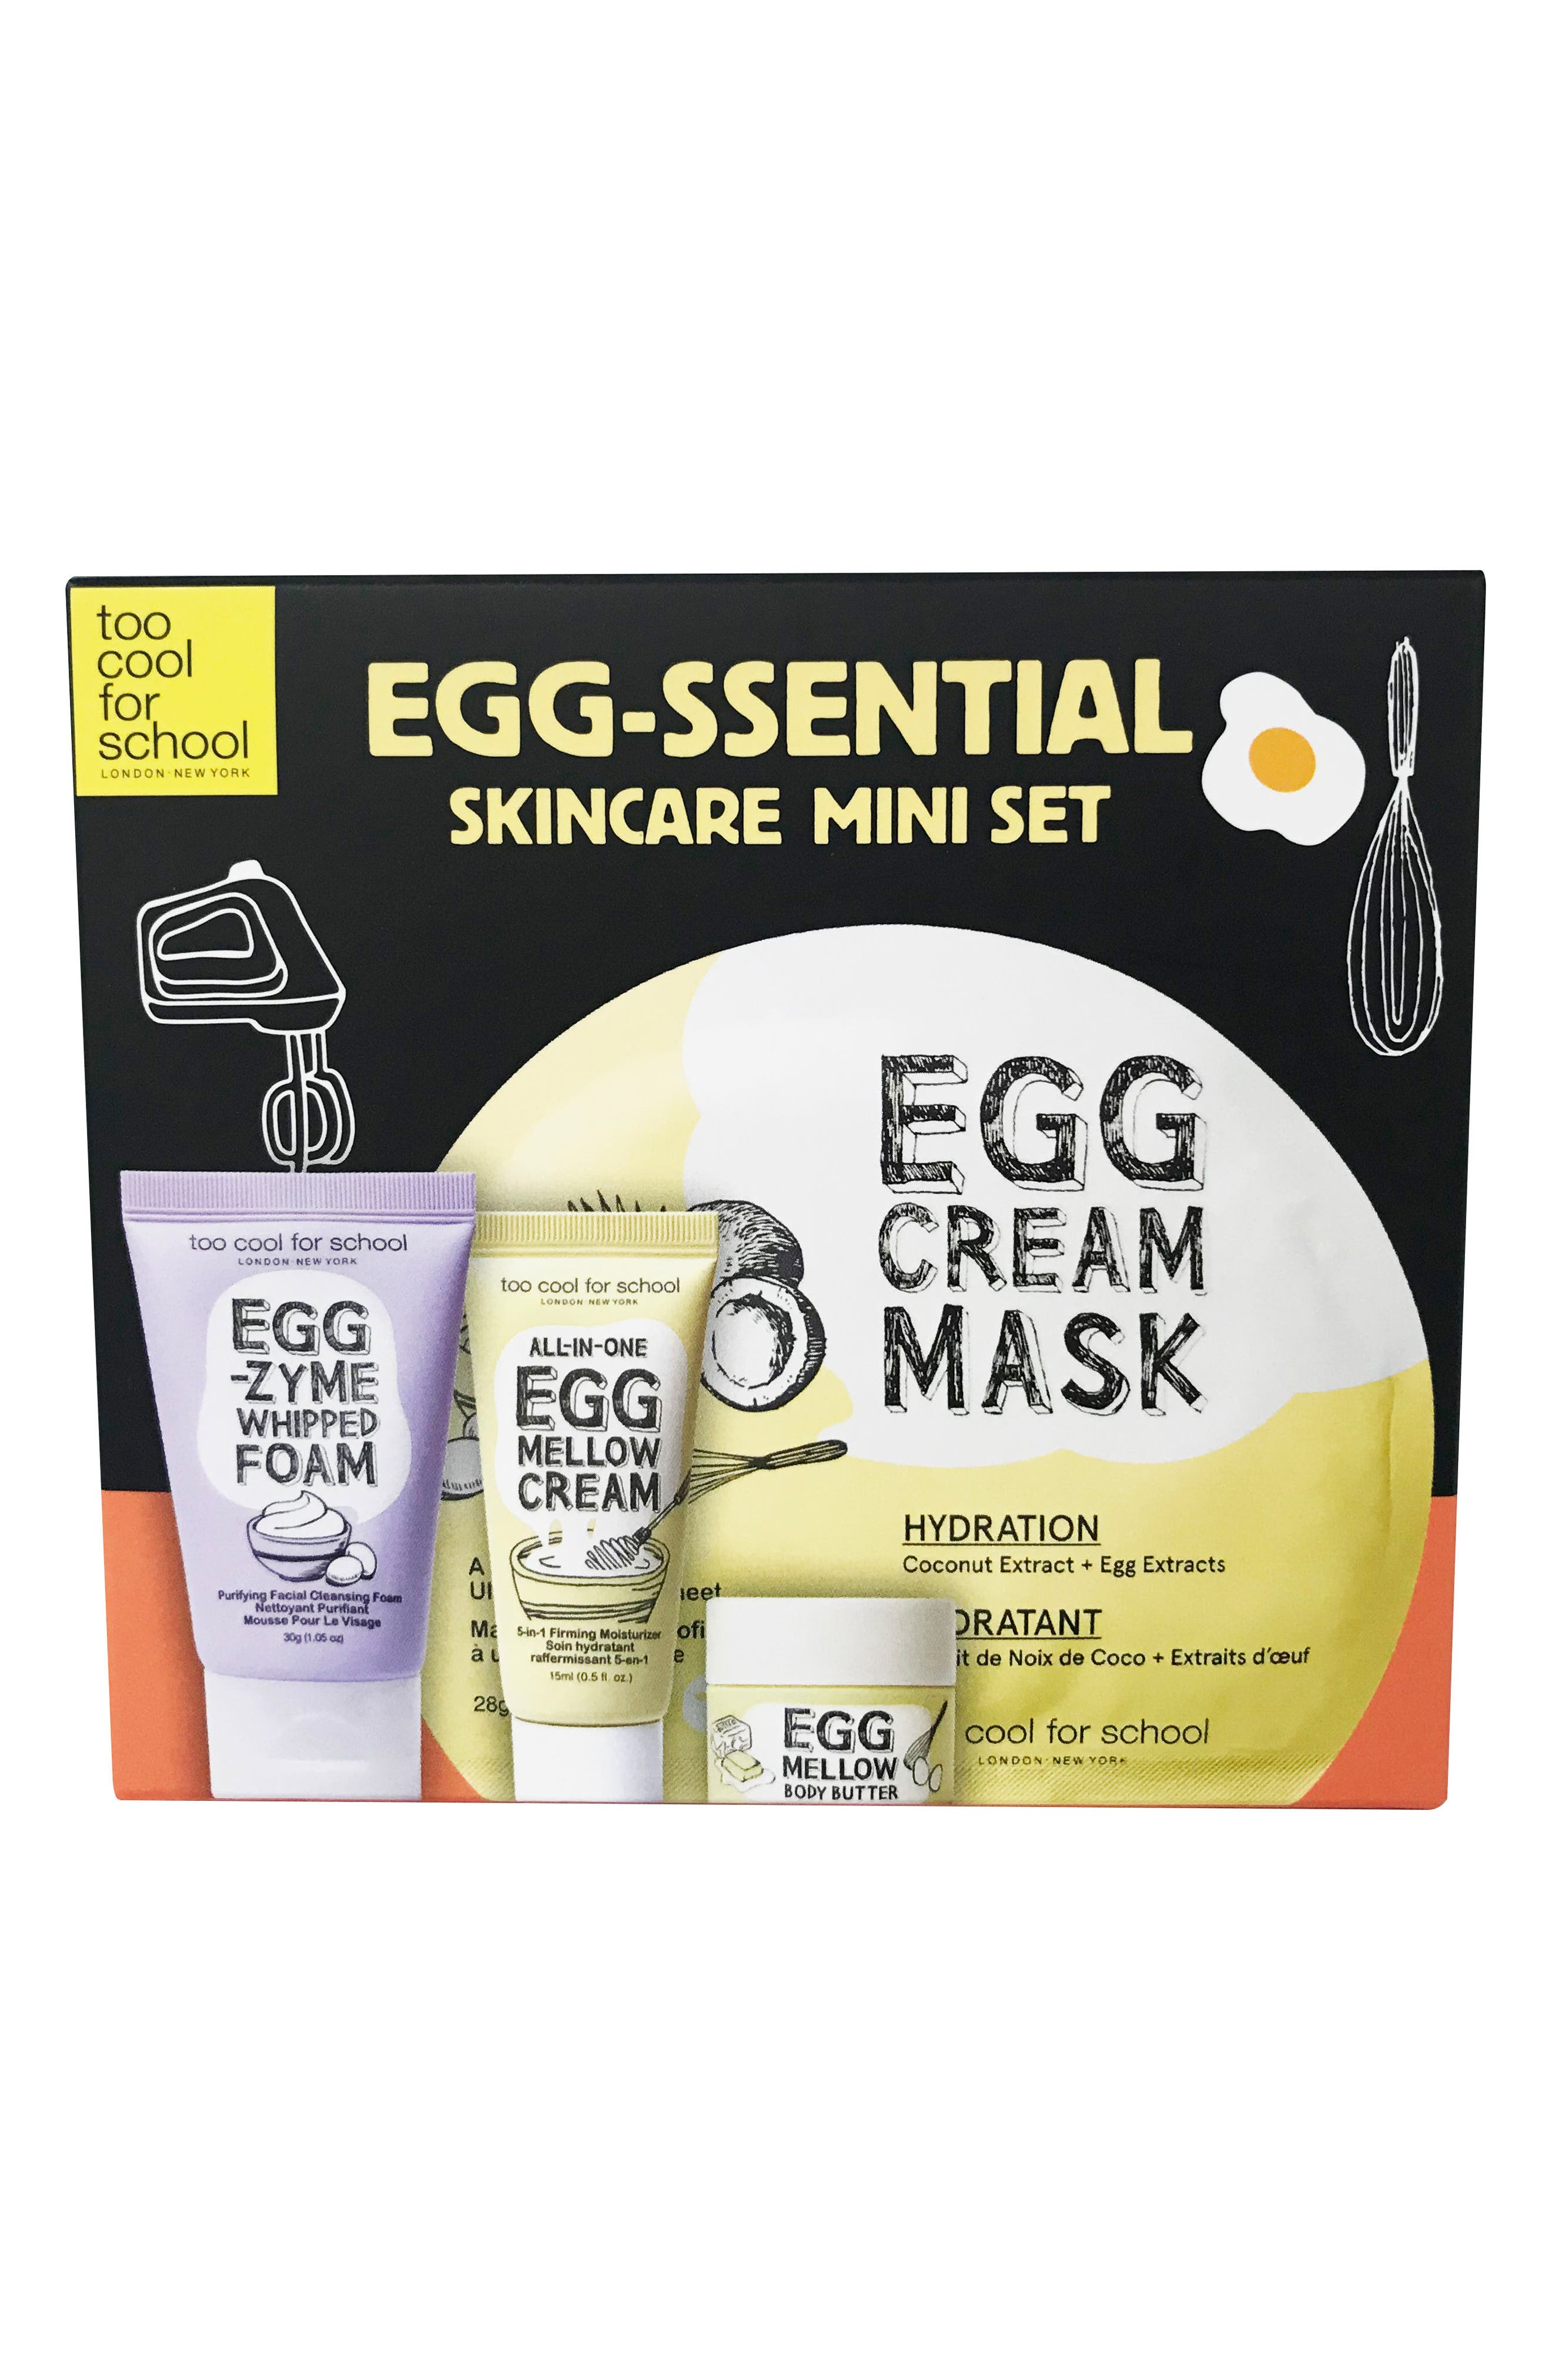 Egg-Ssential Skin Care Mini Set,                         Main,                         color, 000